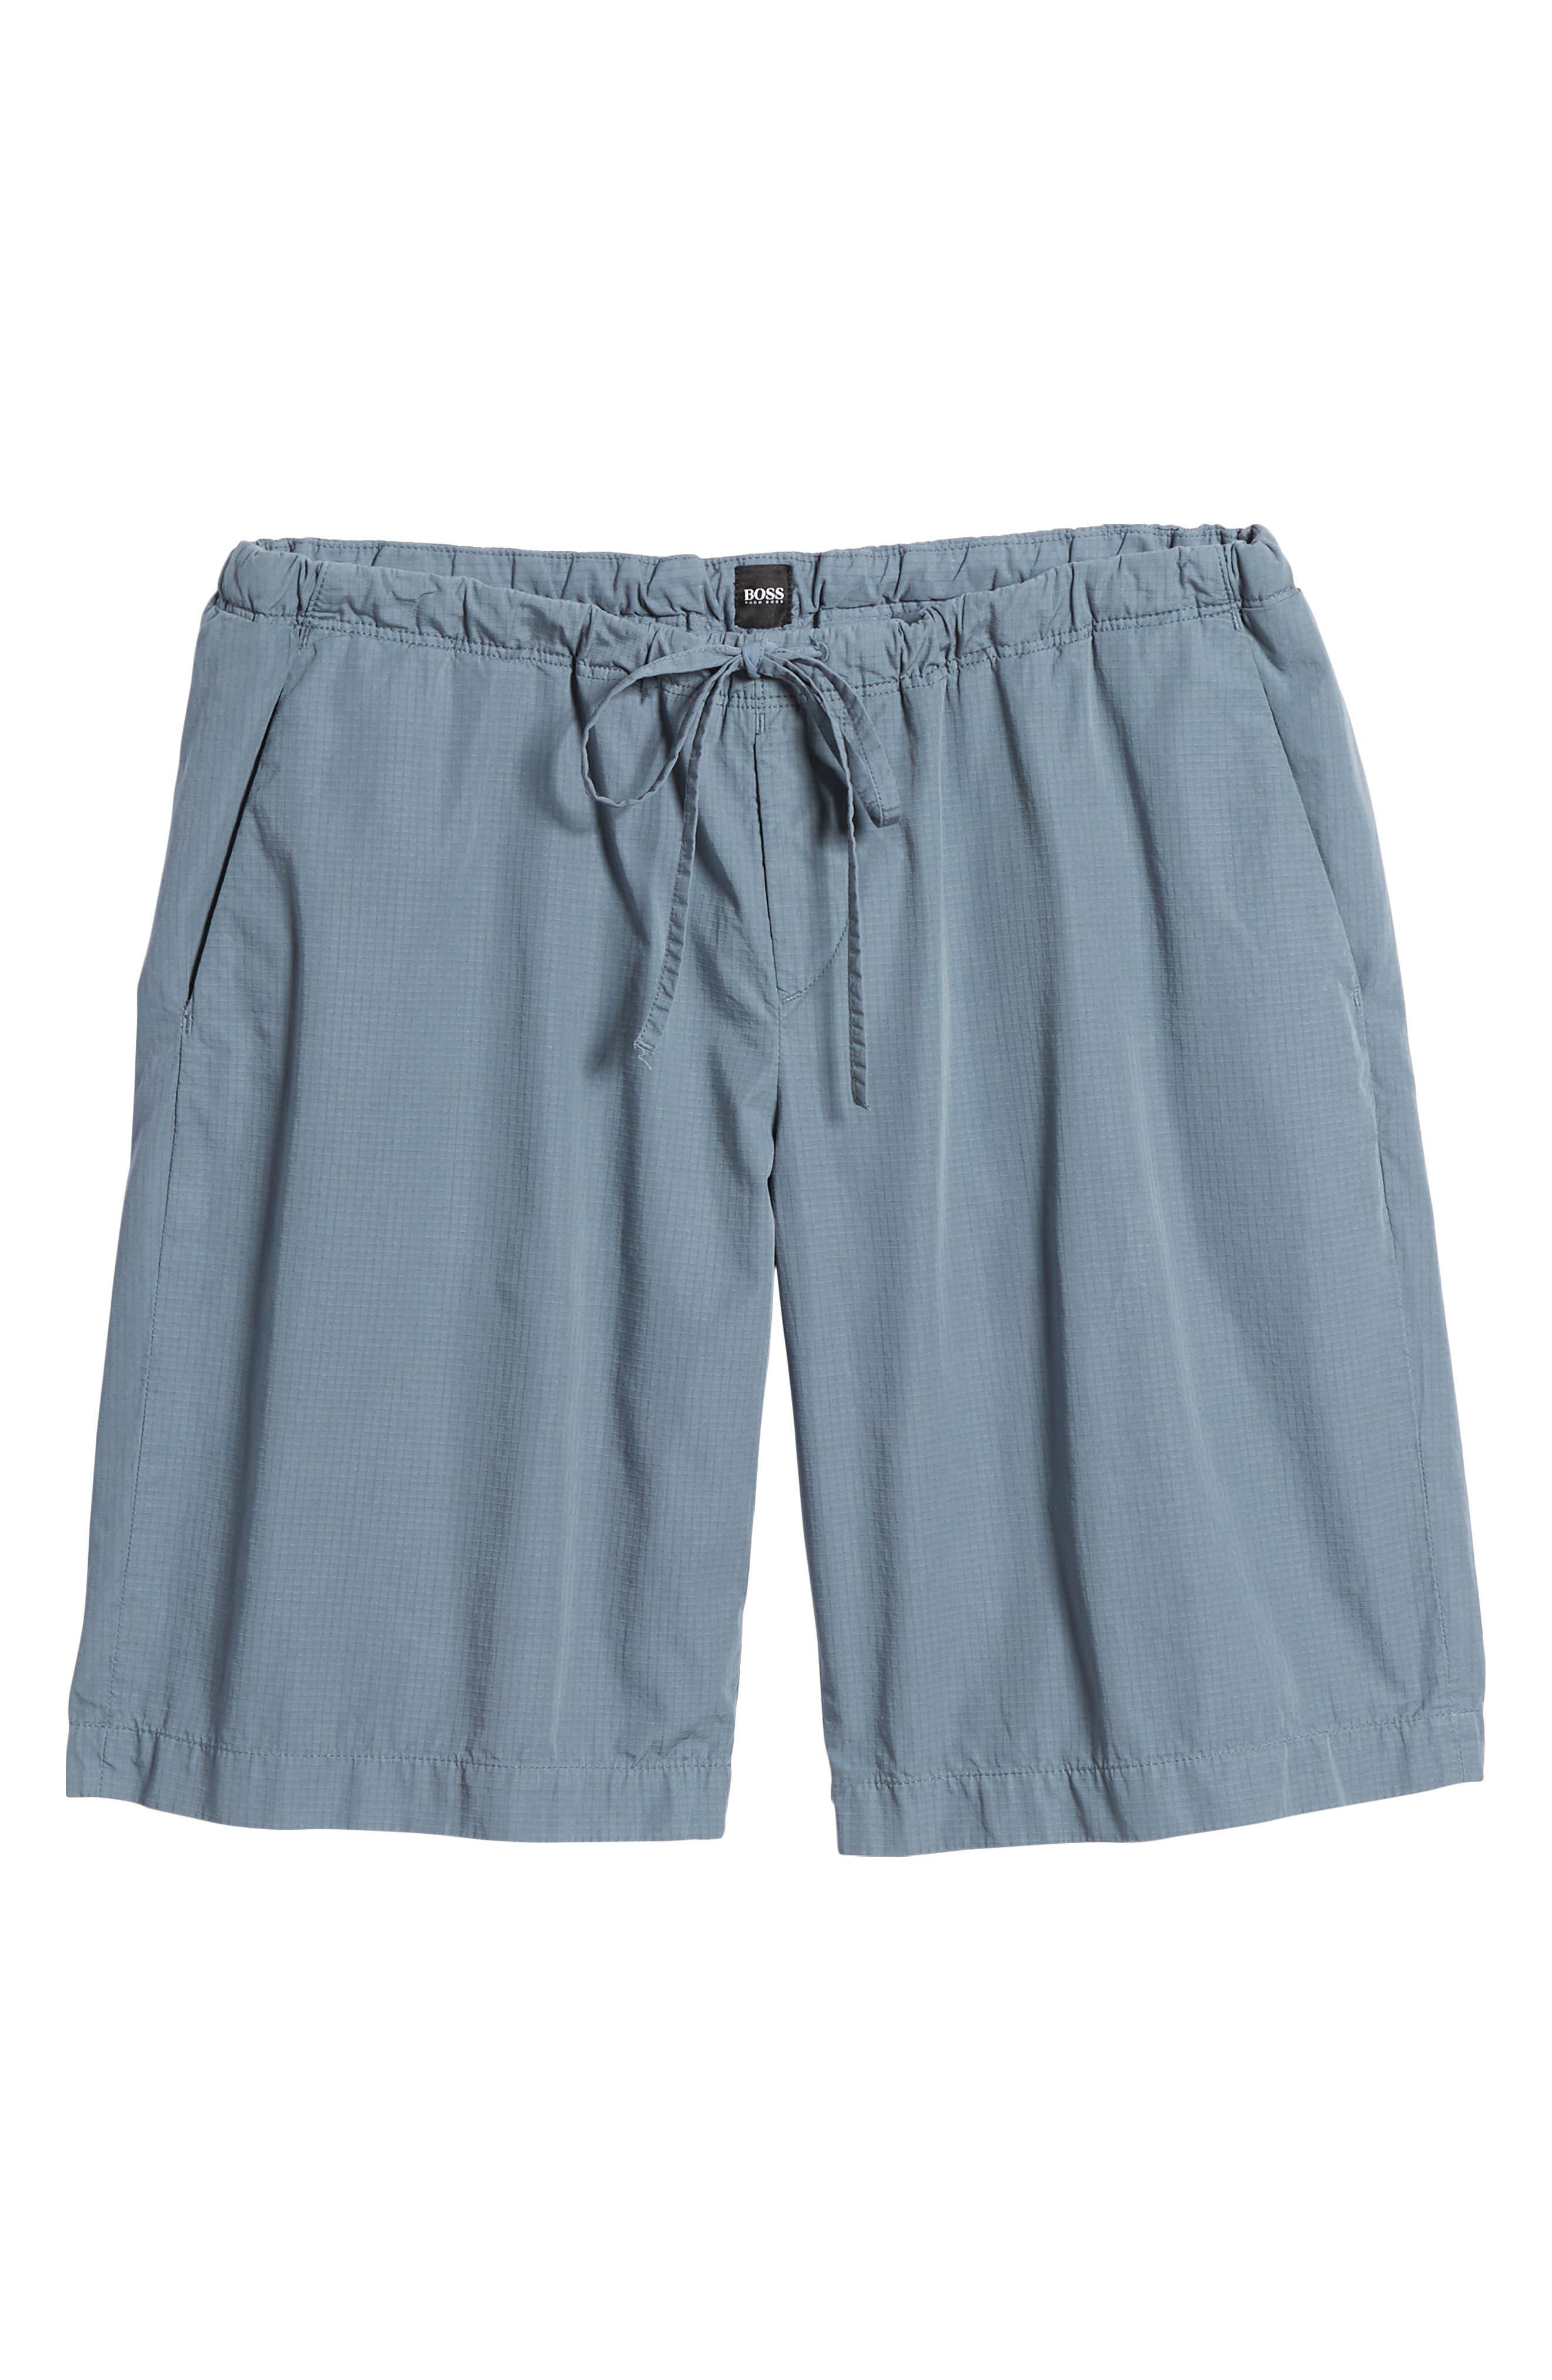 Passeo Cotton Shorts,                             Alternate thumbnail 6, color,                             GREY